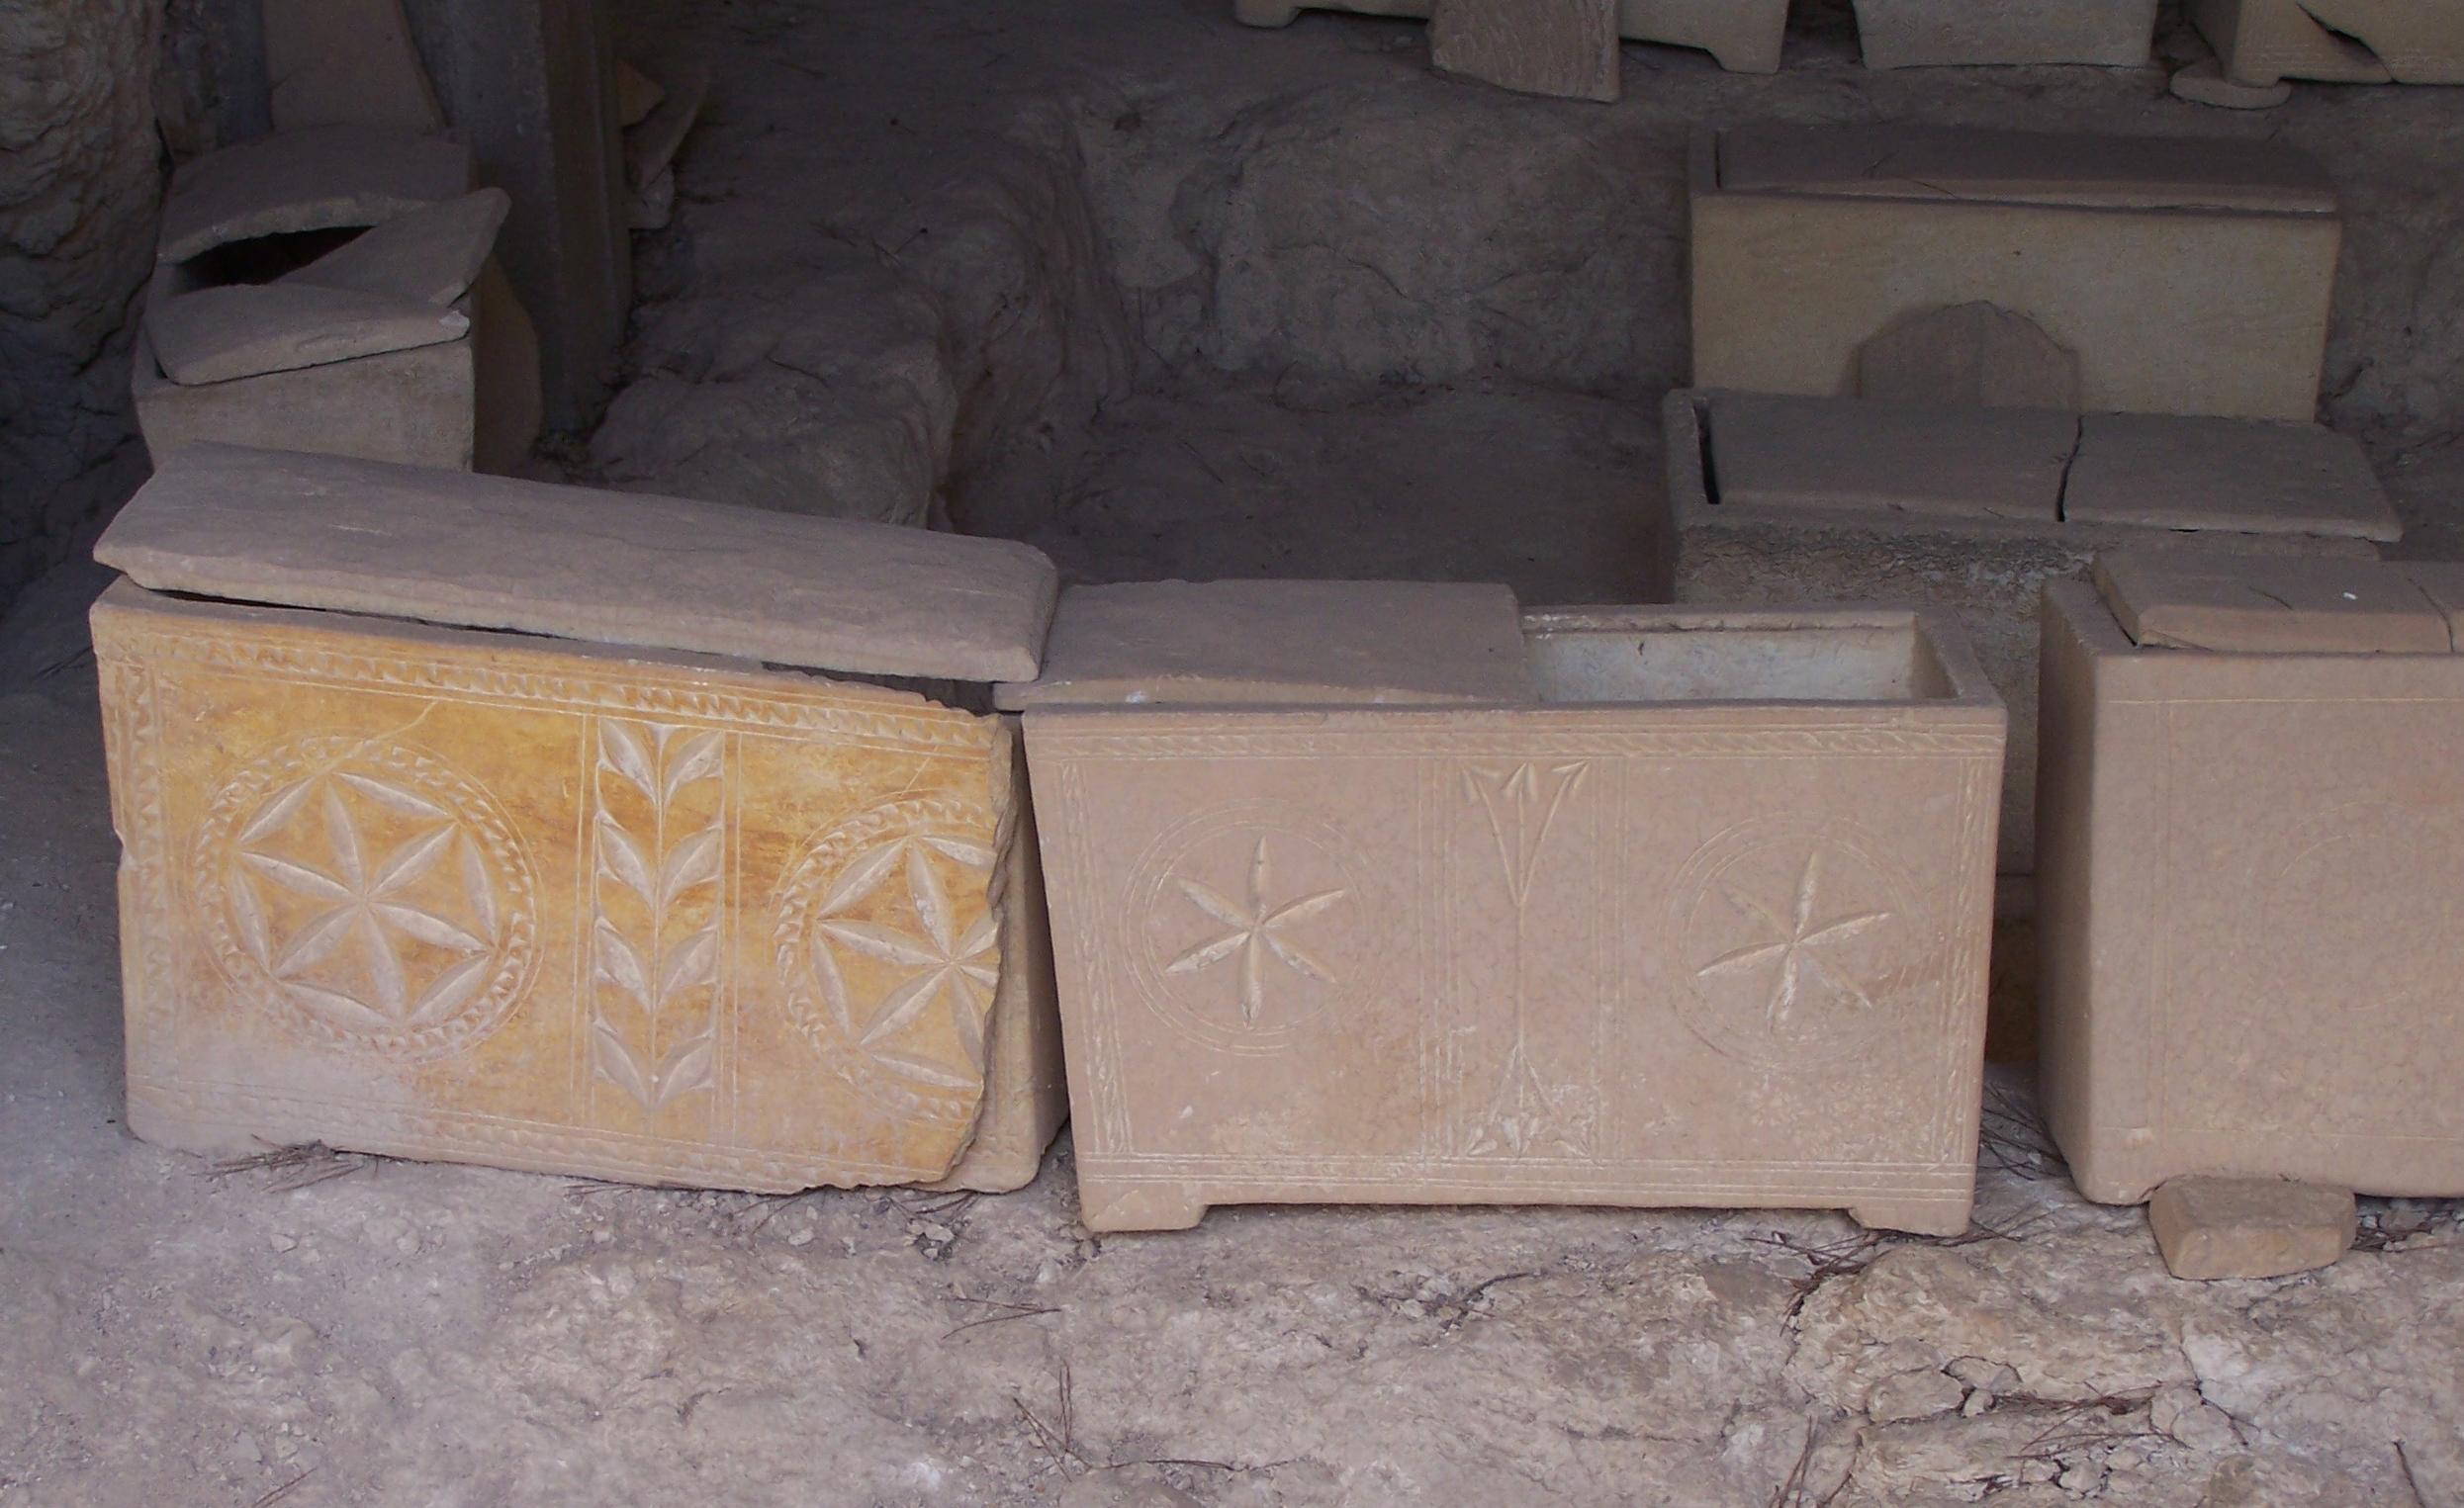 Stone ossuaries (burial boxes for bones) near the Dominus Flevit church on the Mount of Olives. Photo courtesy of Joshua N. Tilton.